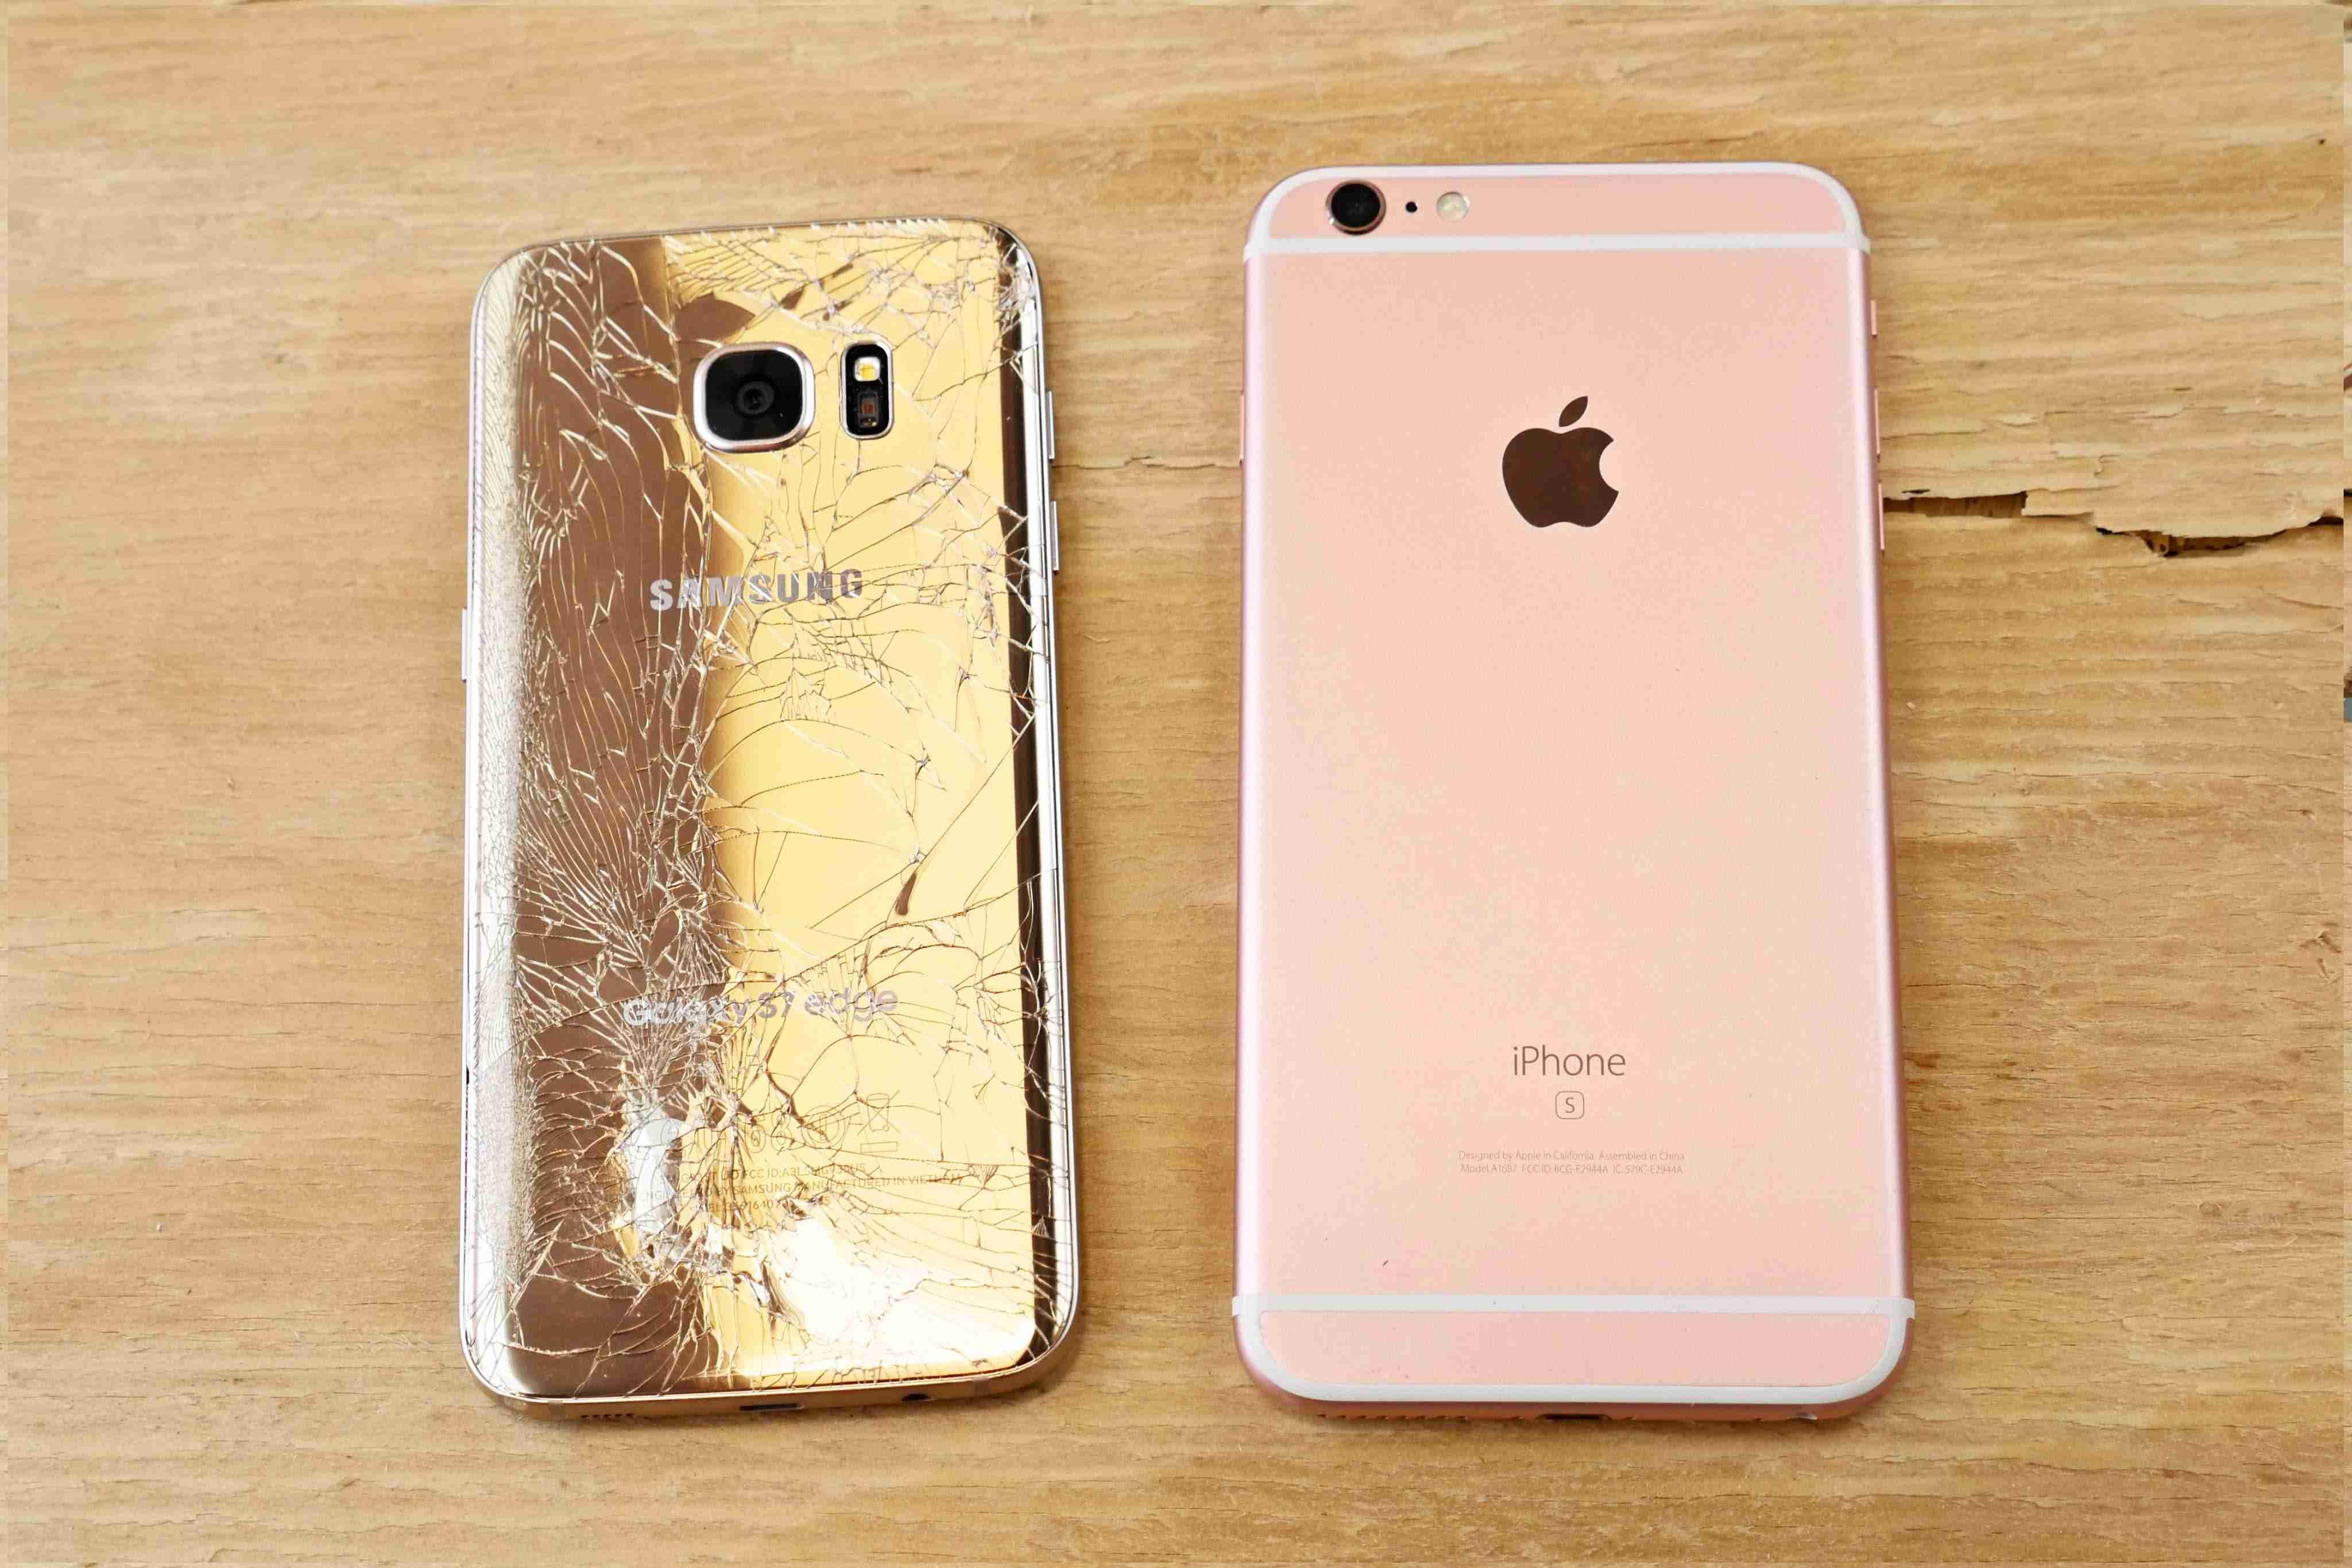 Samsung Galaxy S7 Edge vs iPhone 6S Plus Drop Test! - YouTube